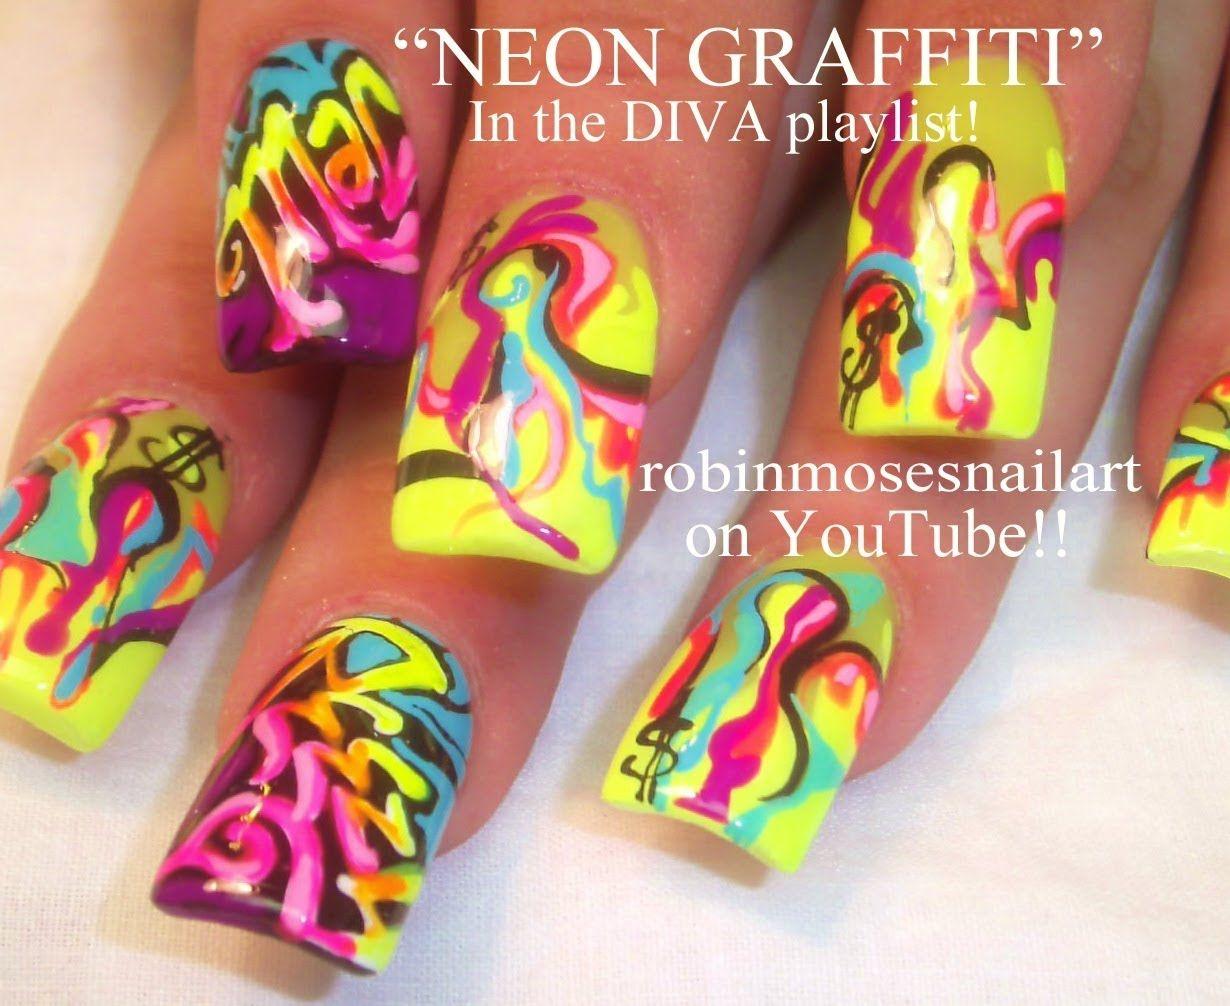 Graffiti art designs - Neon Graffiti